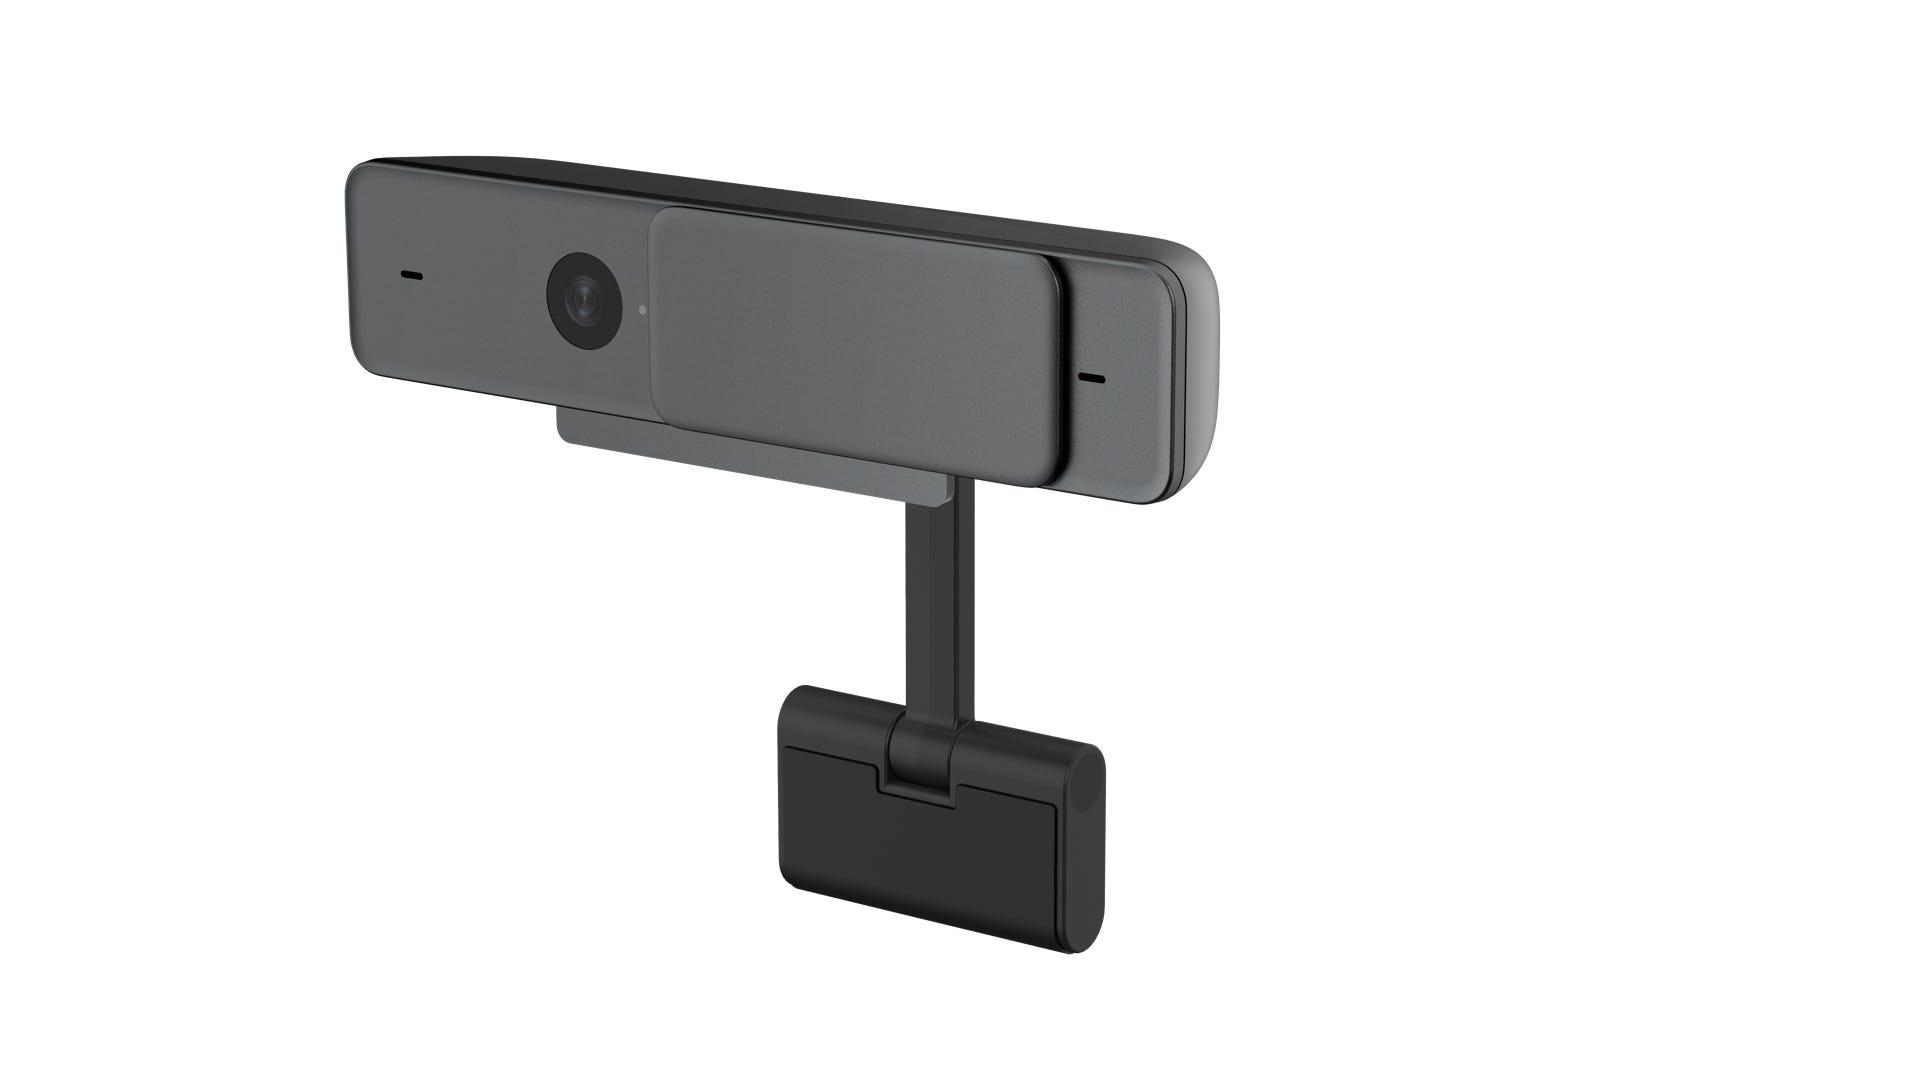 TCL TV webcam accessory